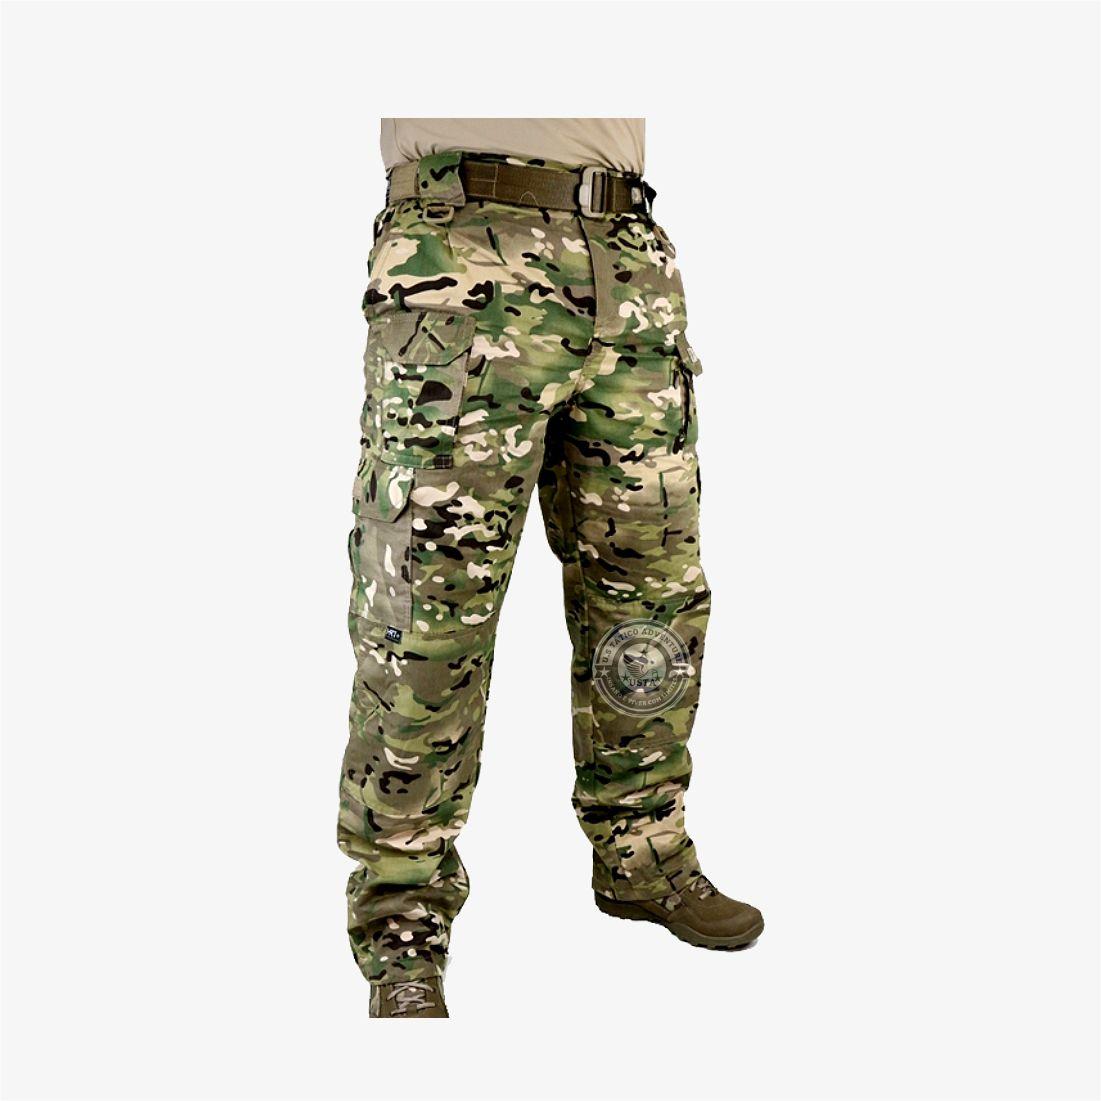 Farda Militar Uniforme Tático HRT MULTICAM TACTICAL DACS ORIGINAL